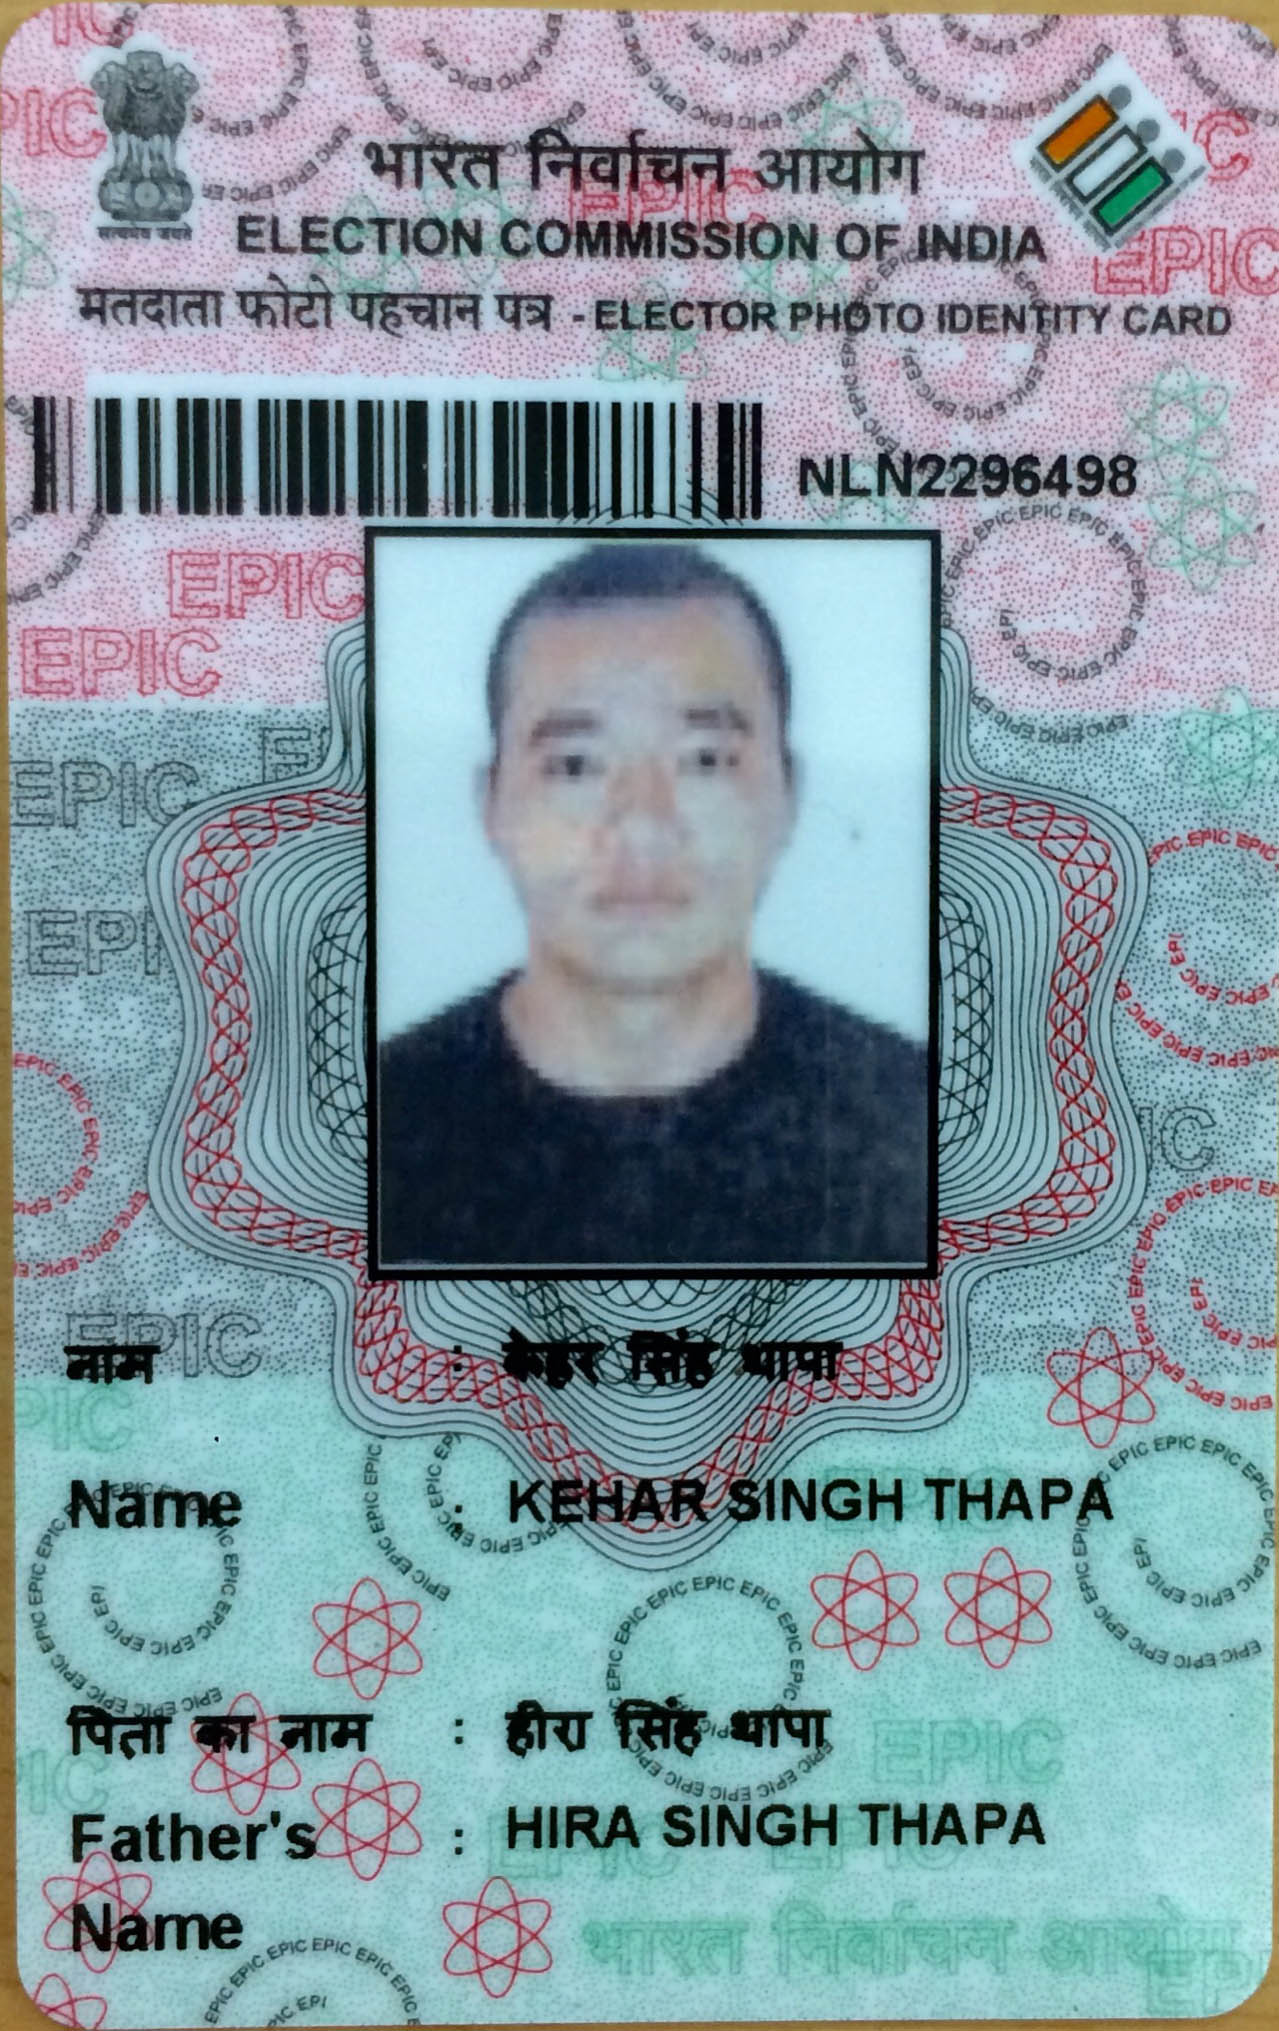 Kehar Singh Thapa